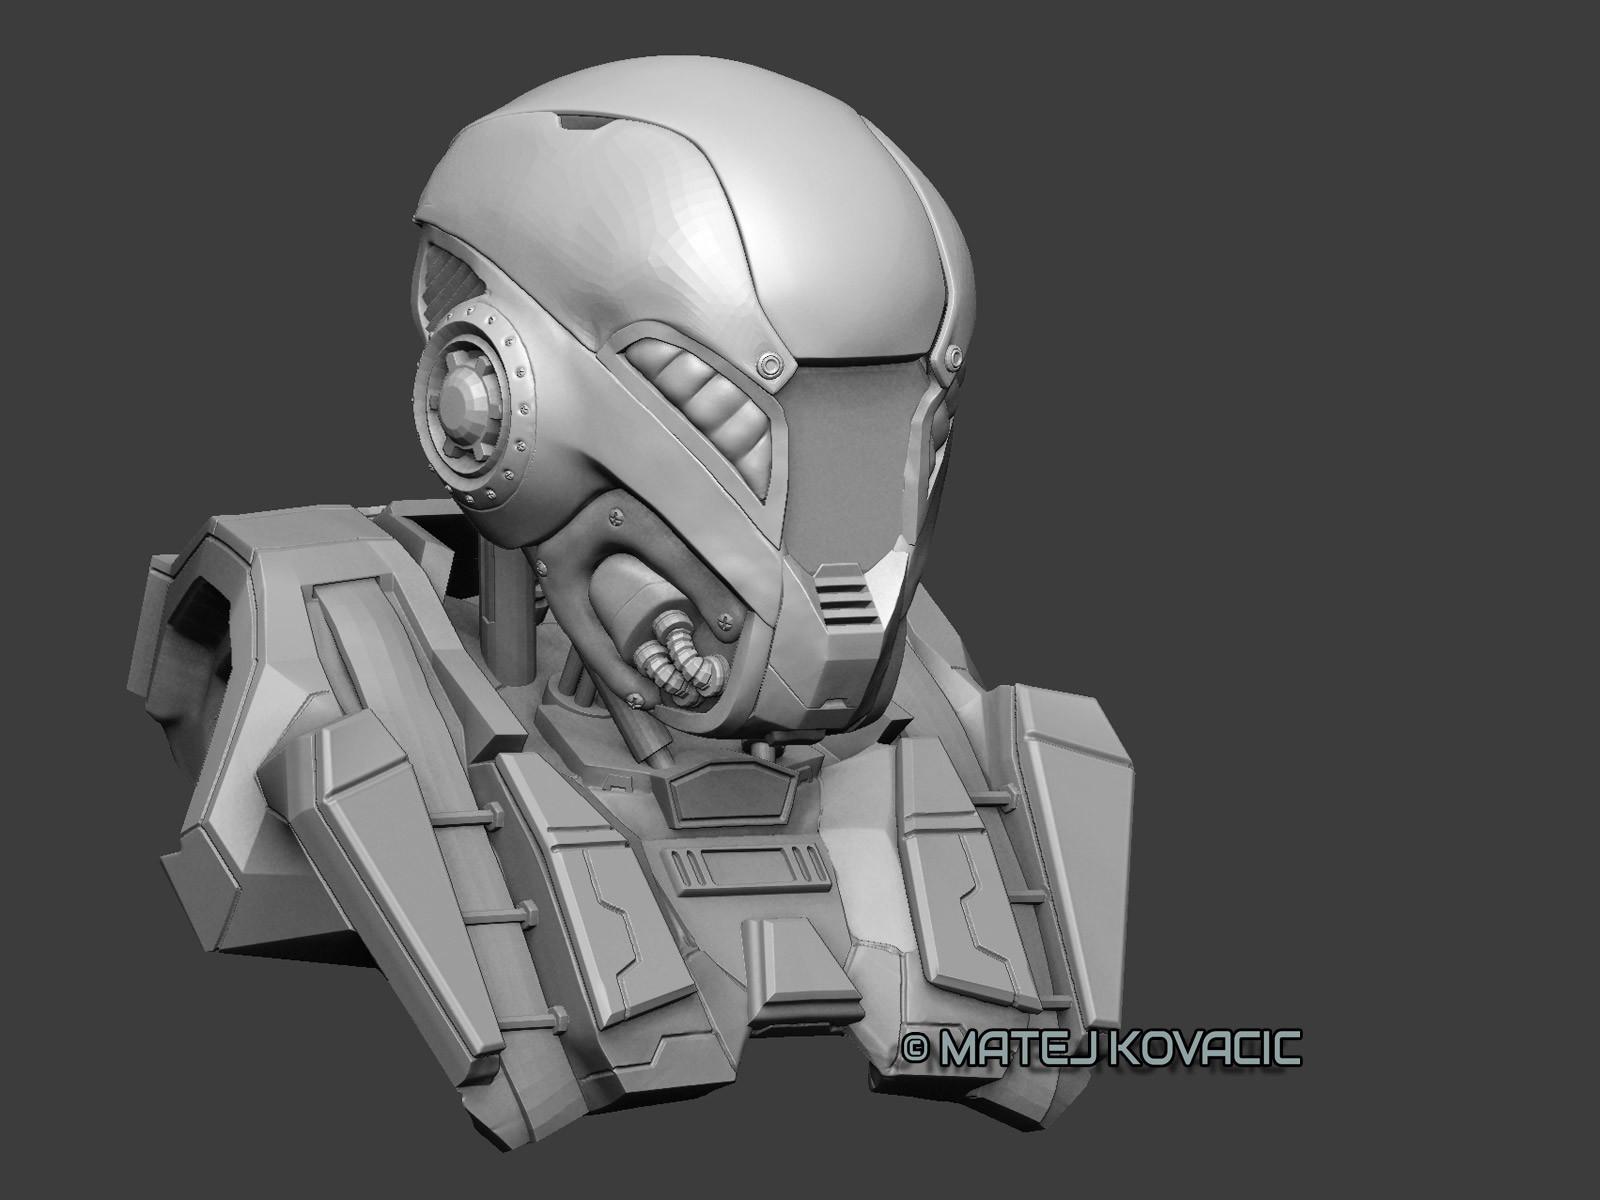 Matej kovacic sci fi helmet rx 51 zb front by matej kovacic